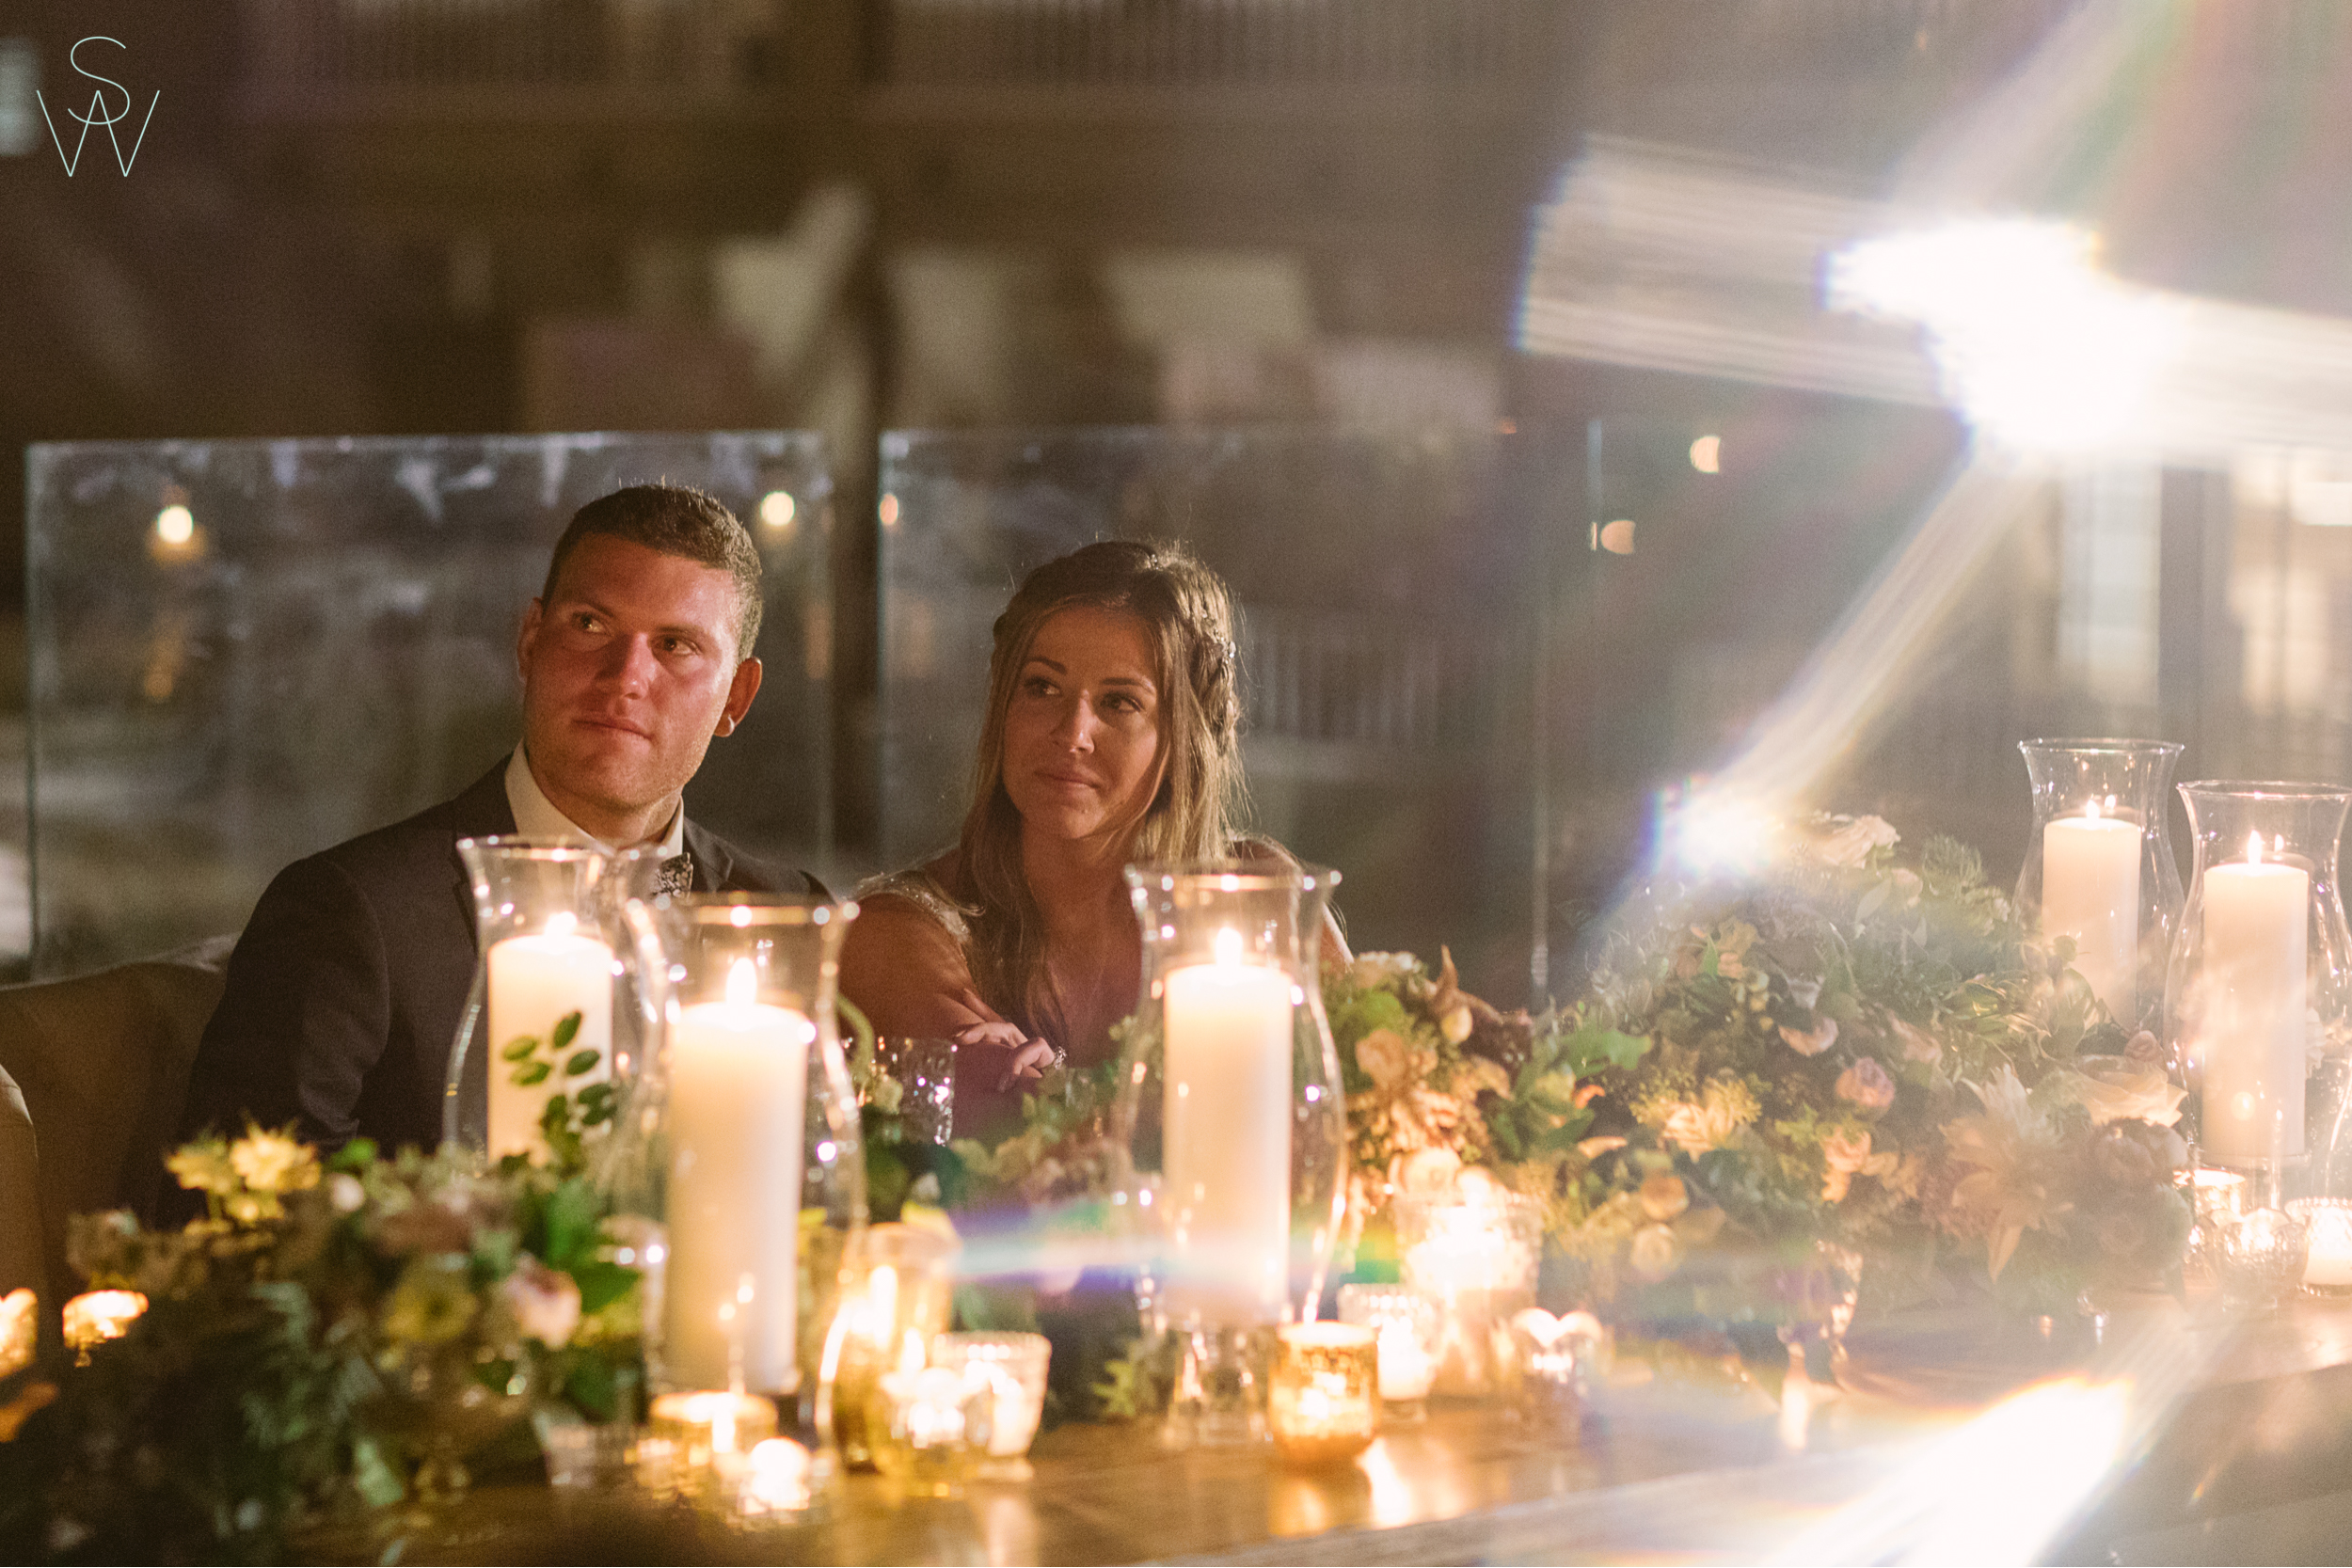 224Lauberge.shewanders.wedding.photography.JPG